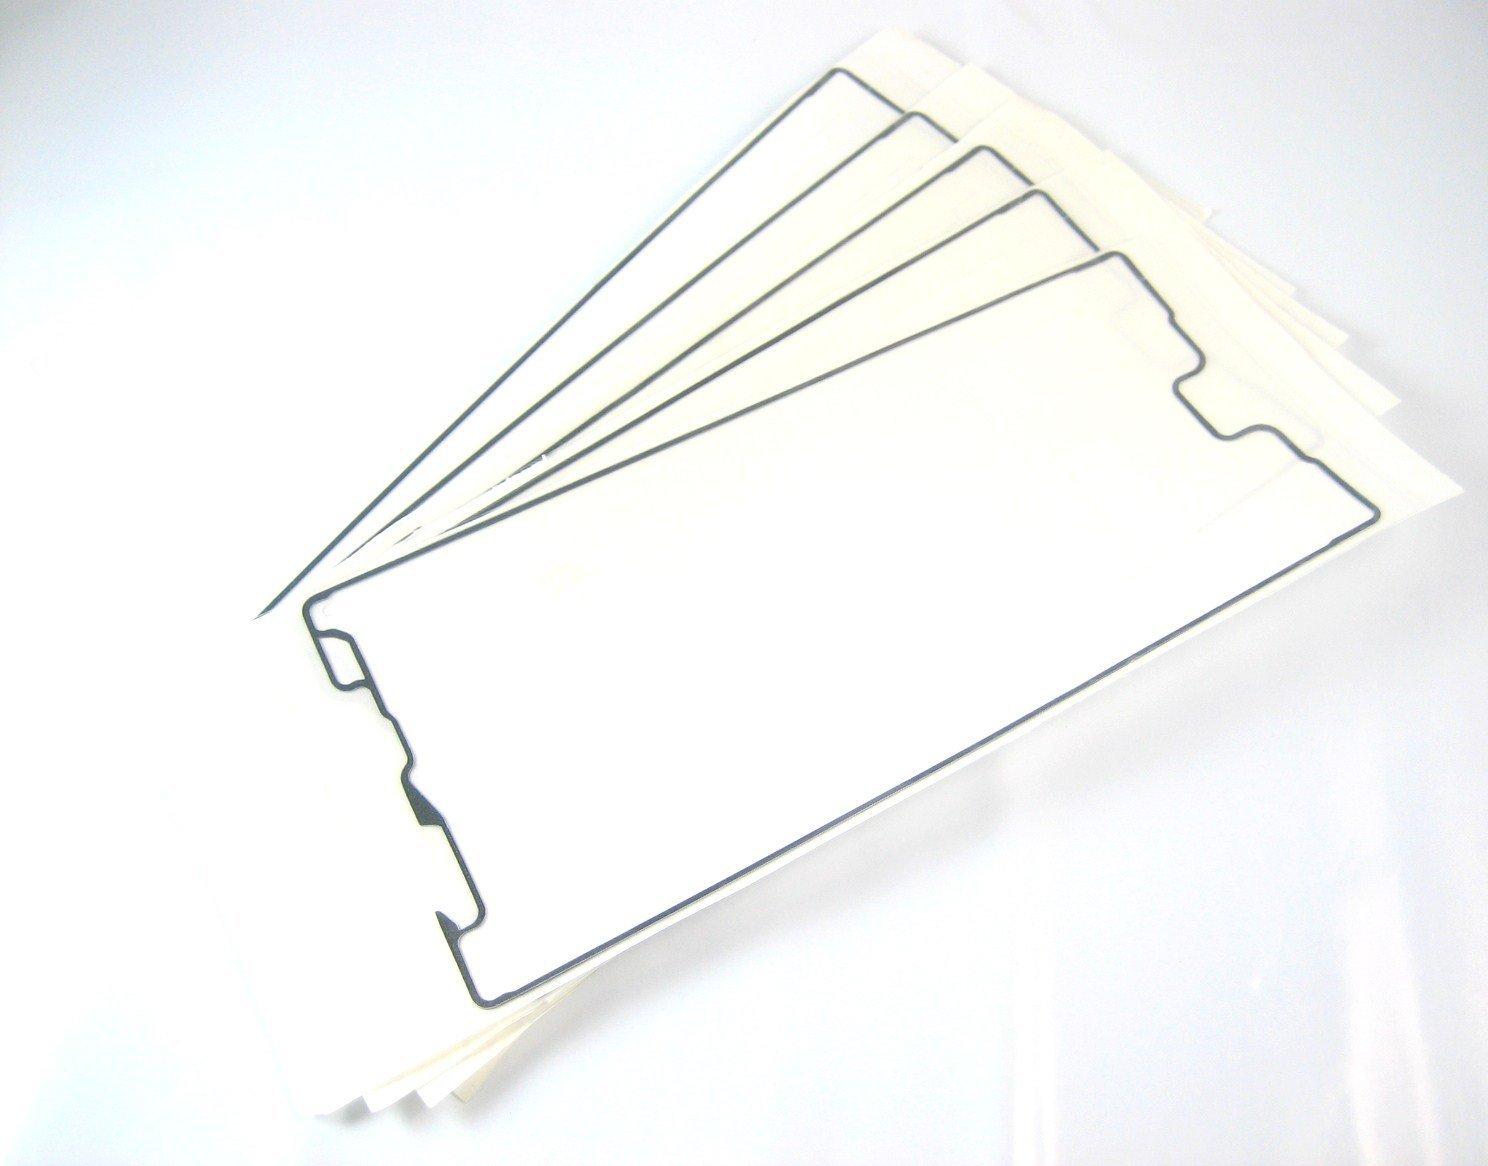 Double Sided Adhesive Sticky Tape for Sony Xperia Z5 Premium E6833(5xFront) 04781-MEADXperiZ5PFx5